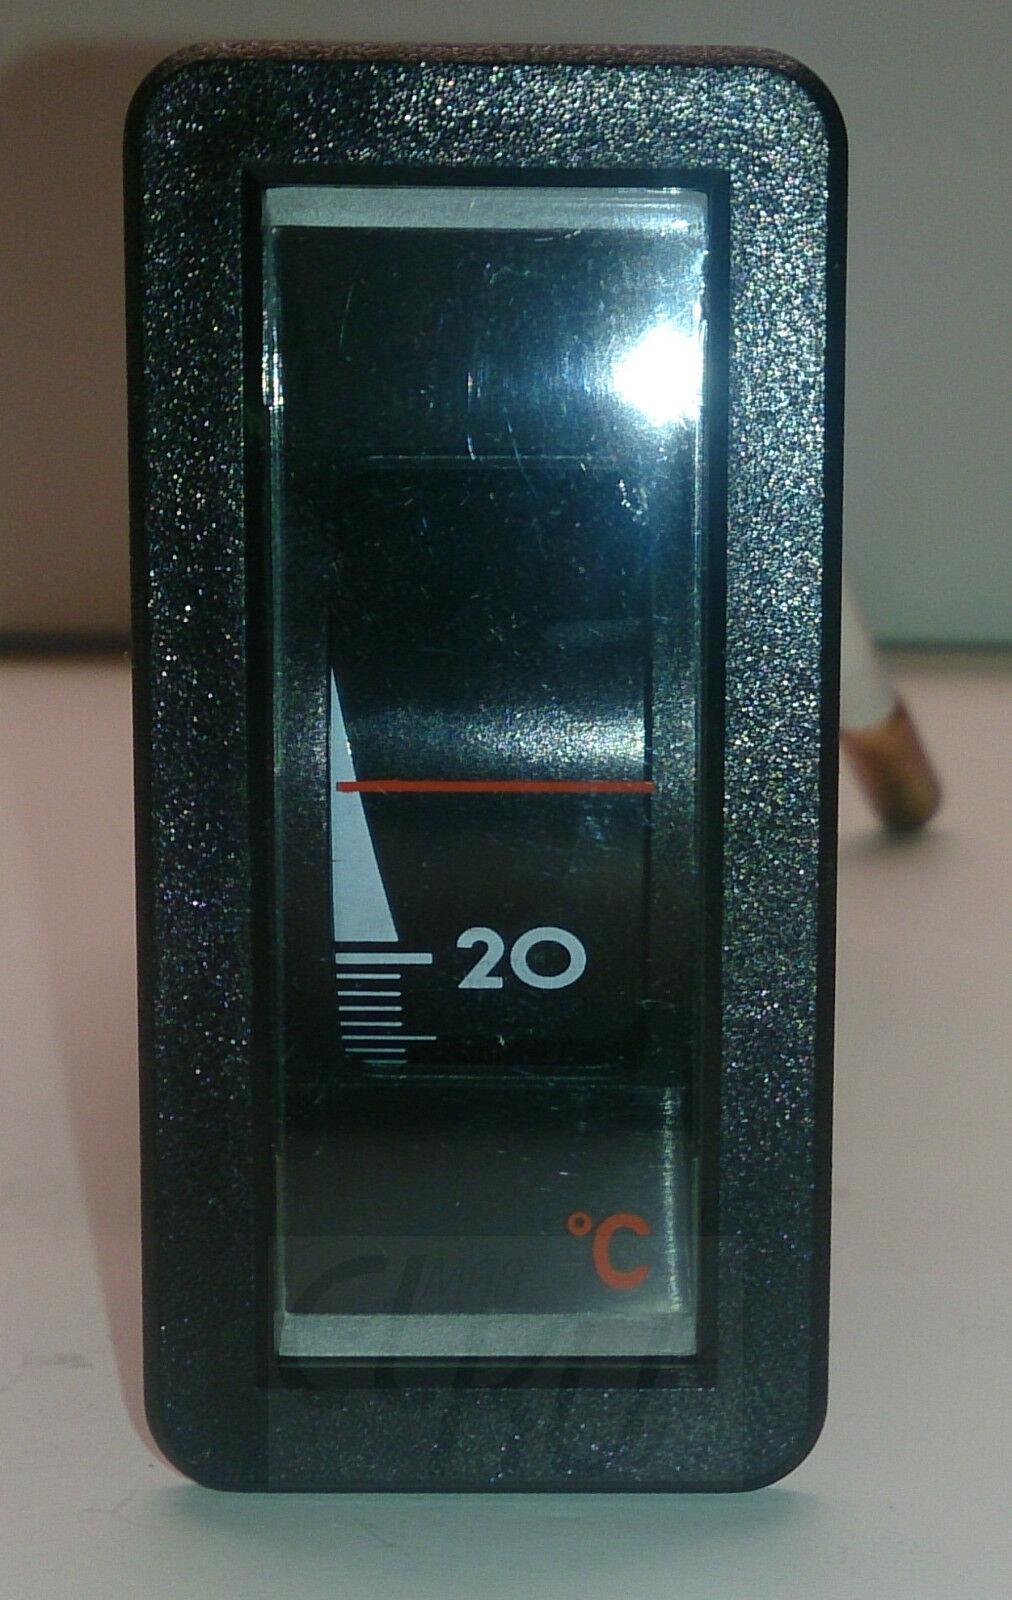 Thermometer groß Jumbo-Display bis 100°C Kabel 5m digital Kesselthermometer LCD